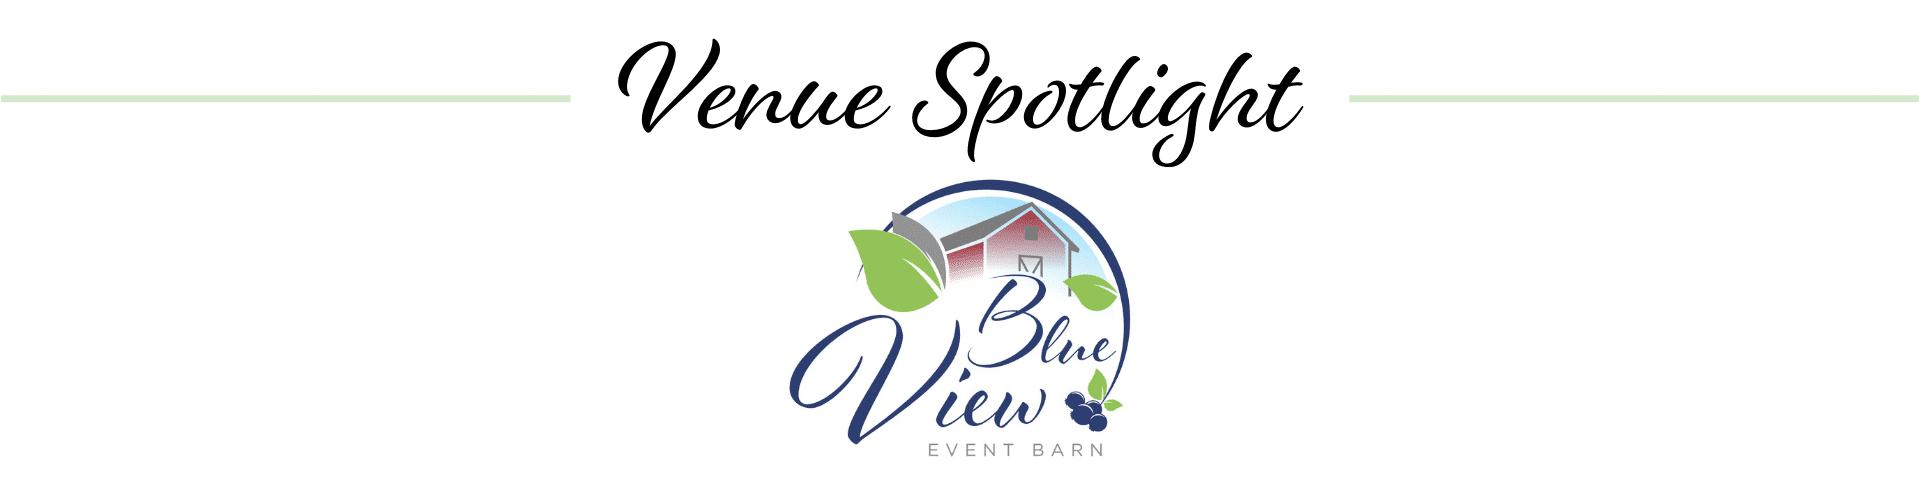 Blue View Event Barn logo